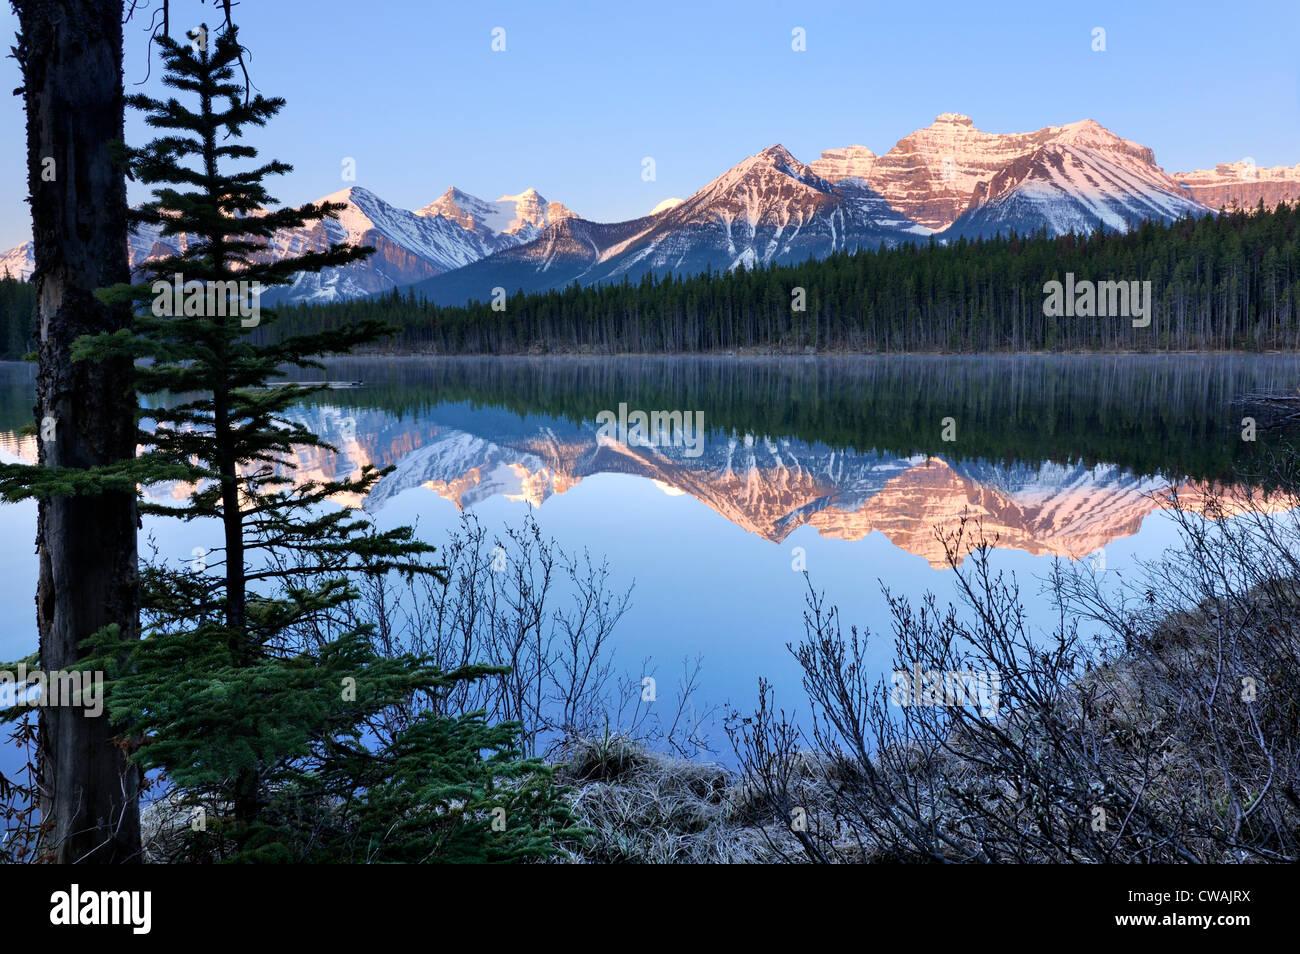 Herbert Lake and Bow Range, Banff National Park, Alberta, Canada - Stock Image